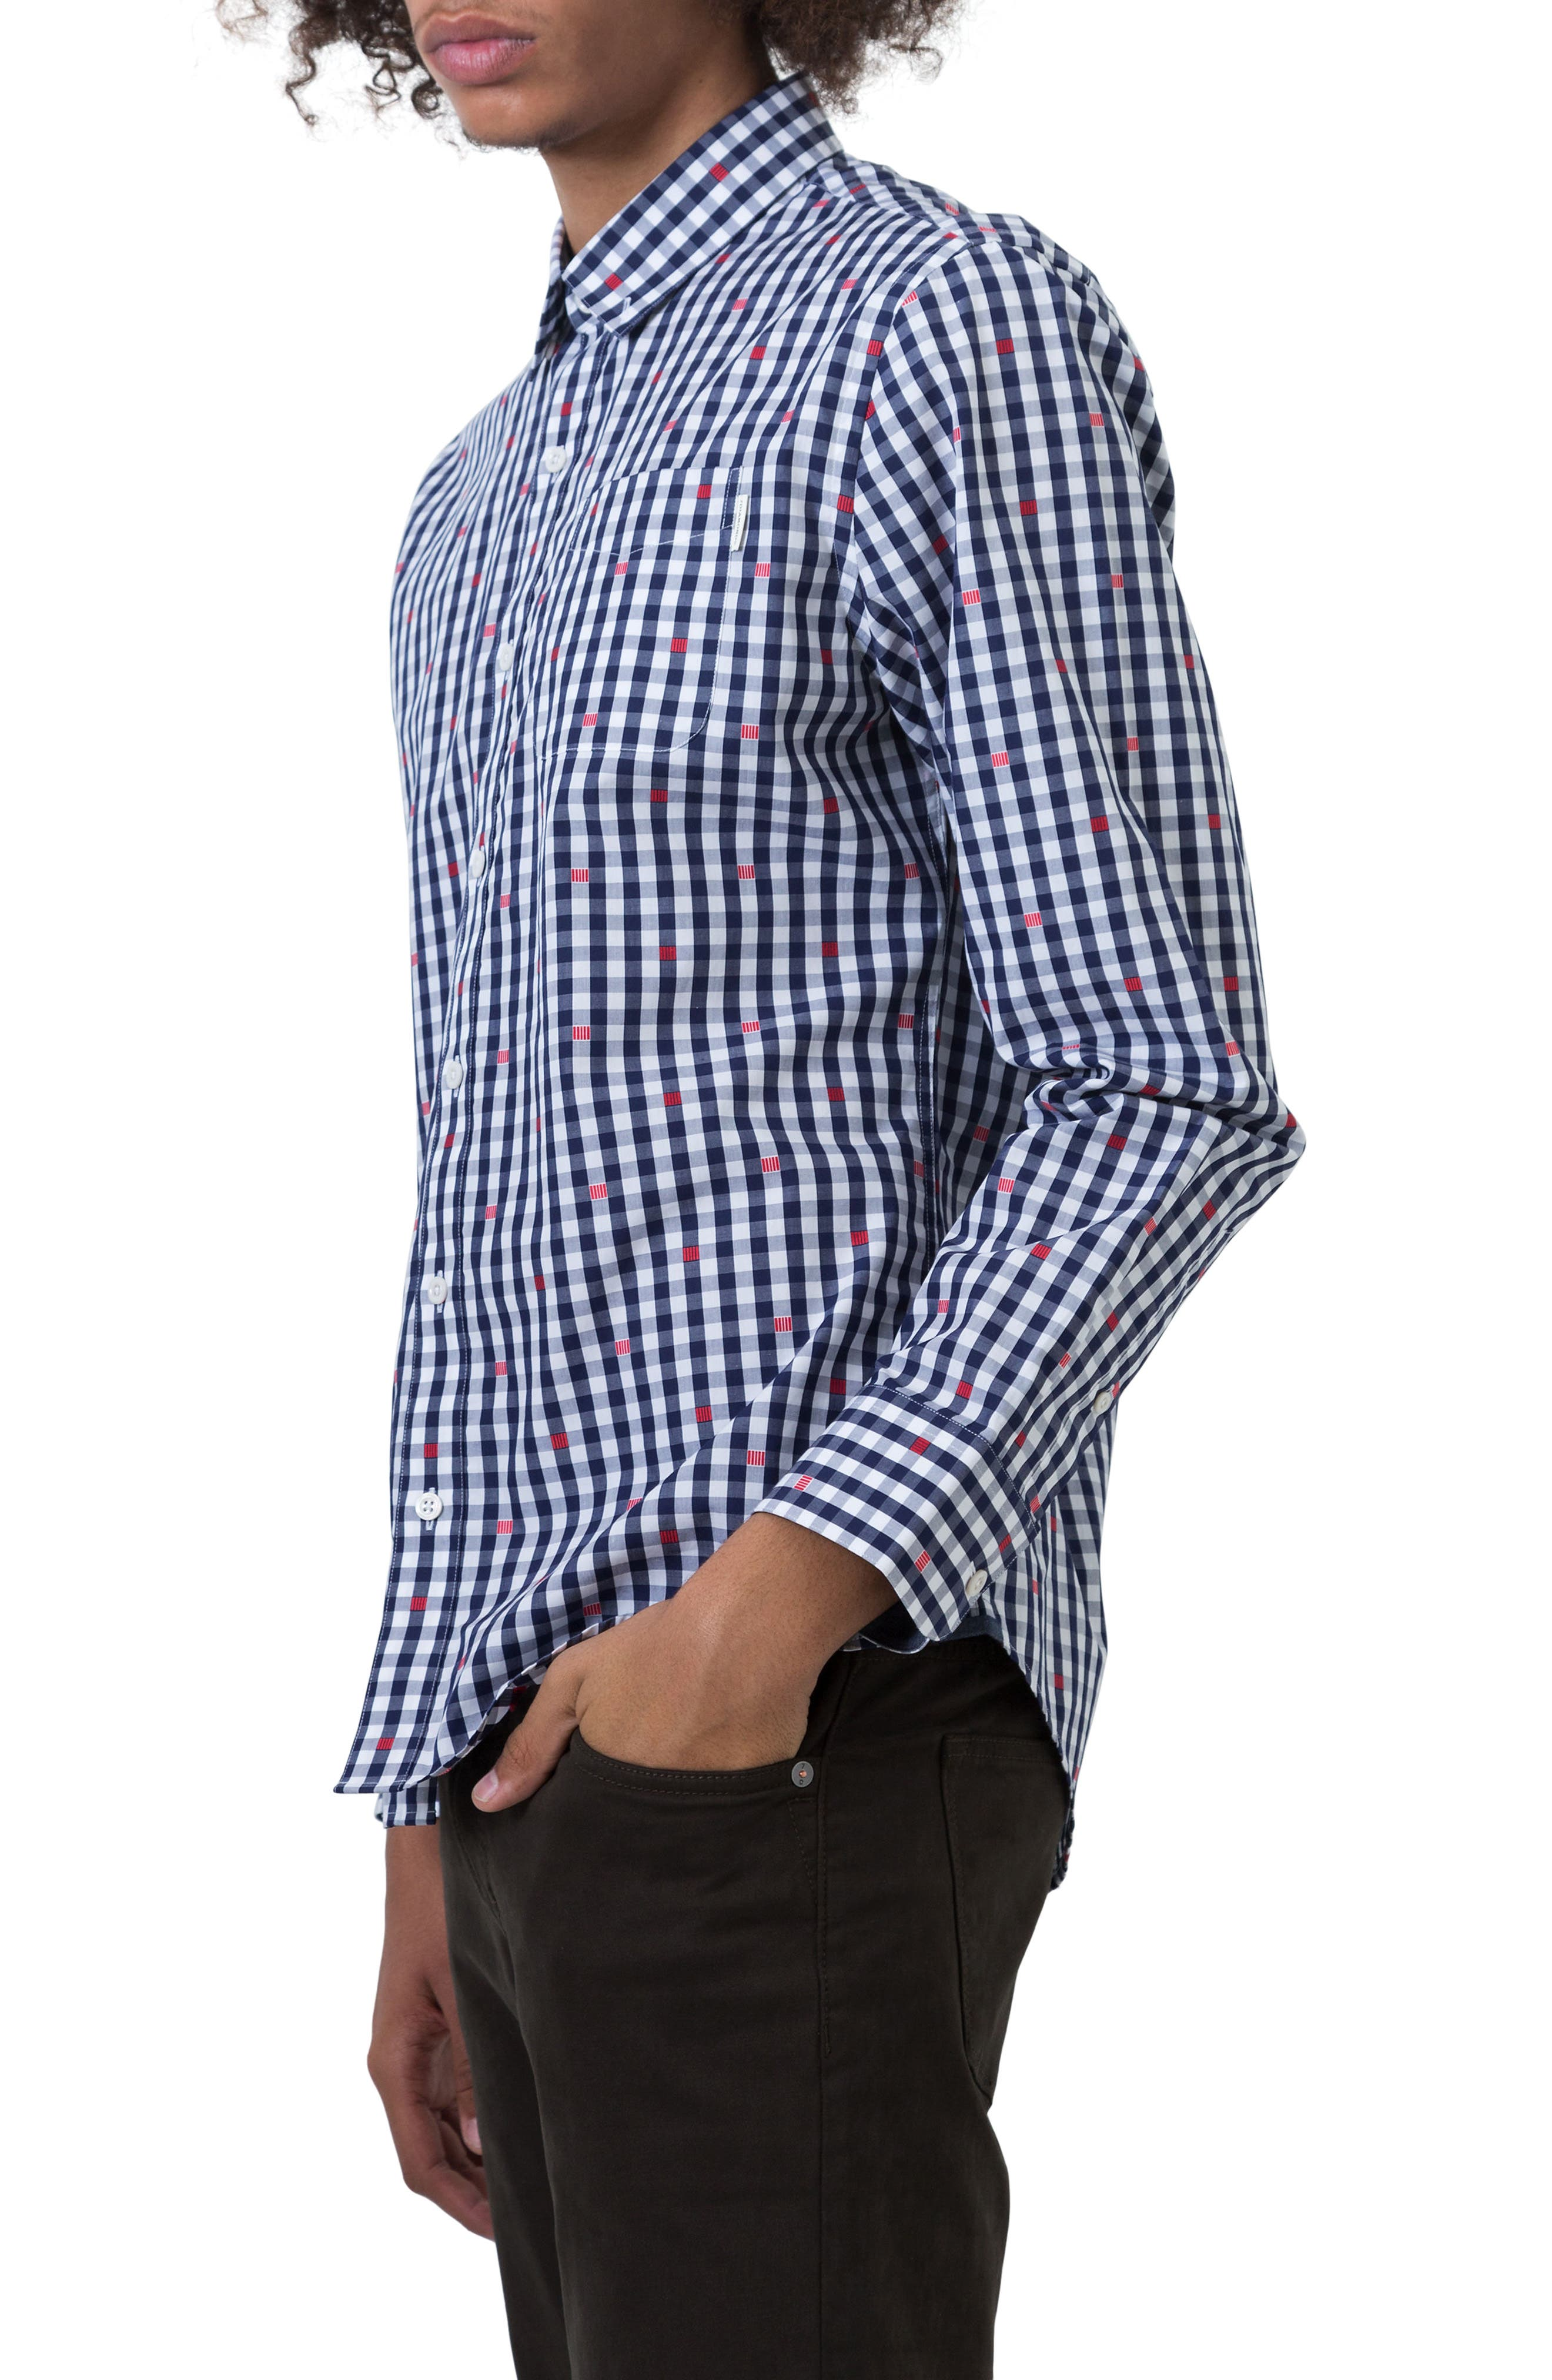 Petrichor Woven Shirt,                             Alternate thumbnail 3, color,                             Navy